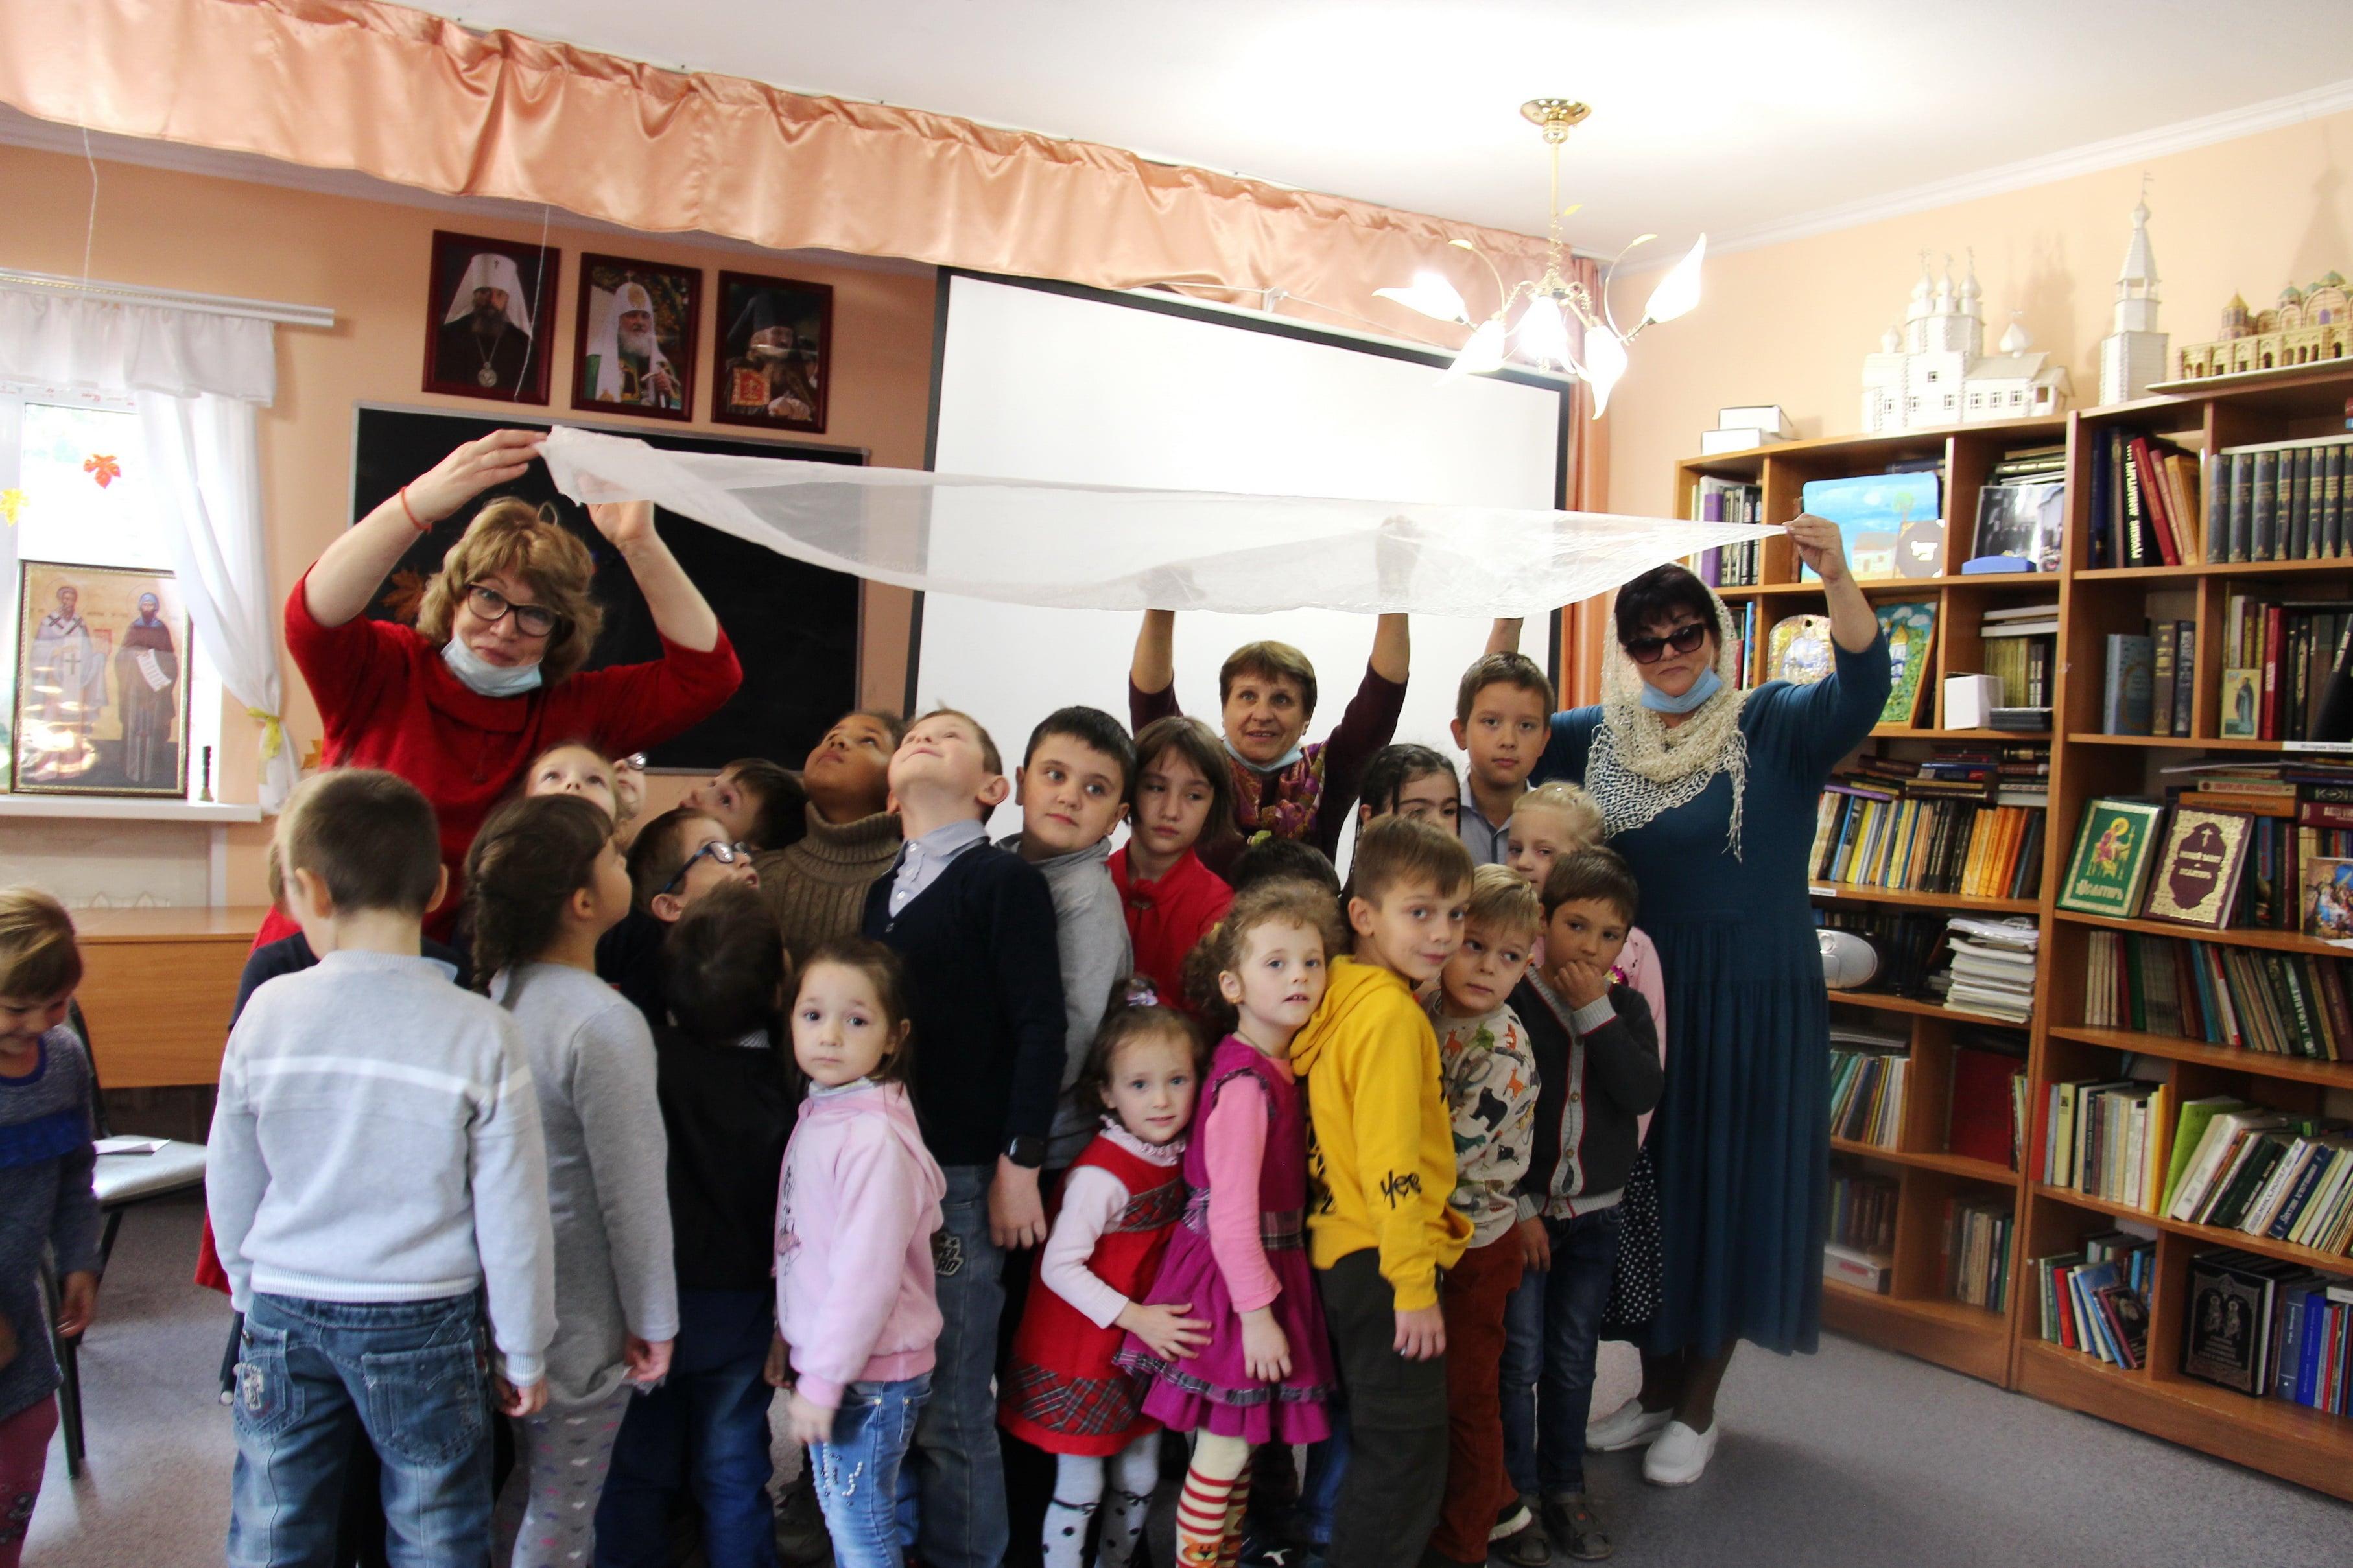 http://monuspen.ru/photoreports/fc5a55242e7b84c0470853f732be7923.JPG